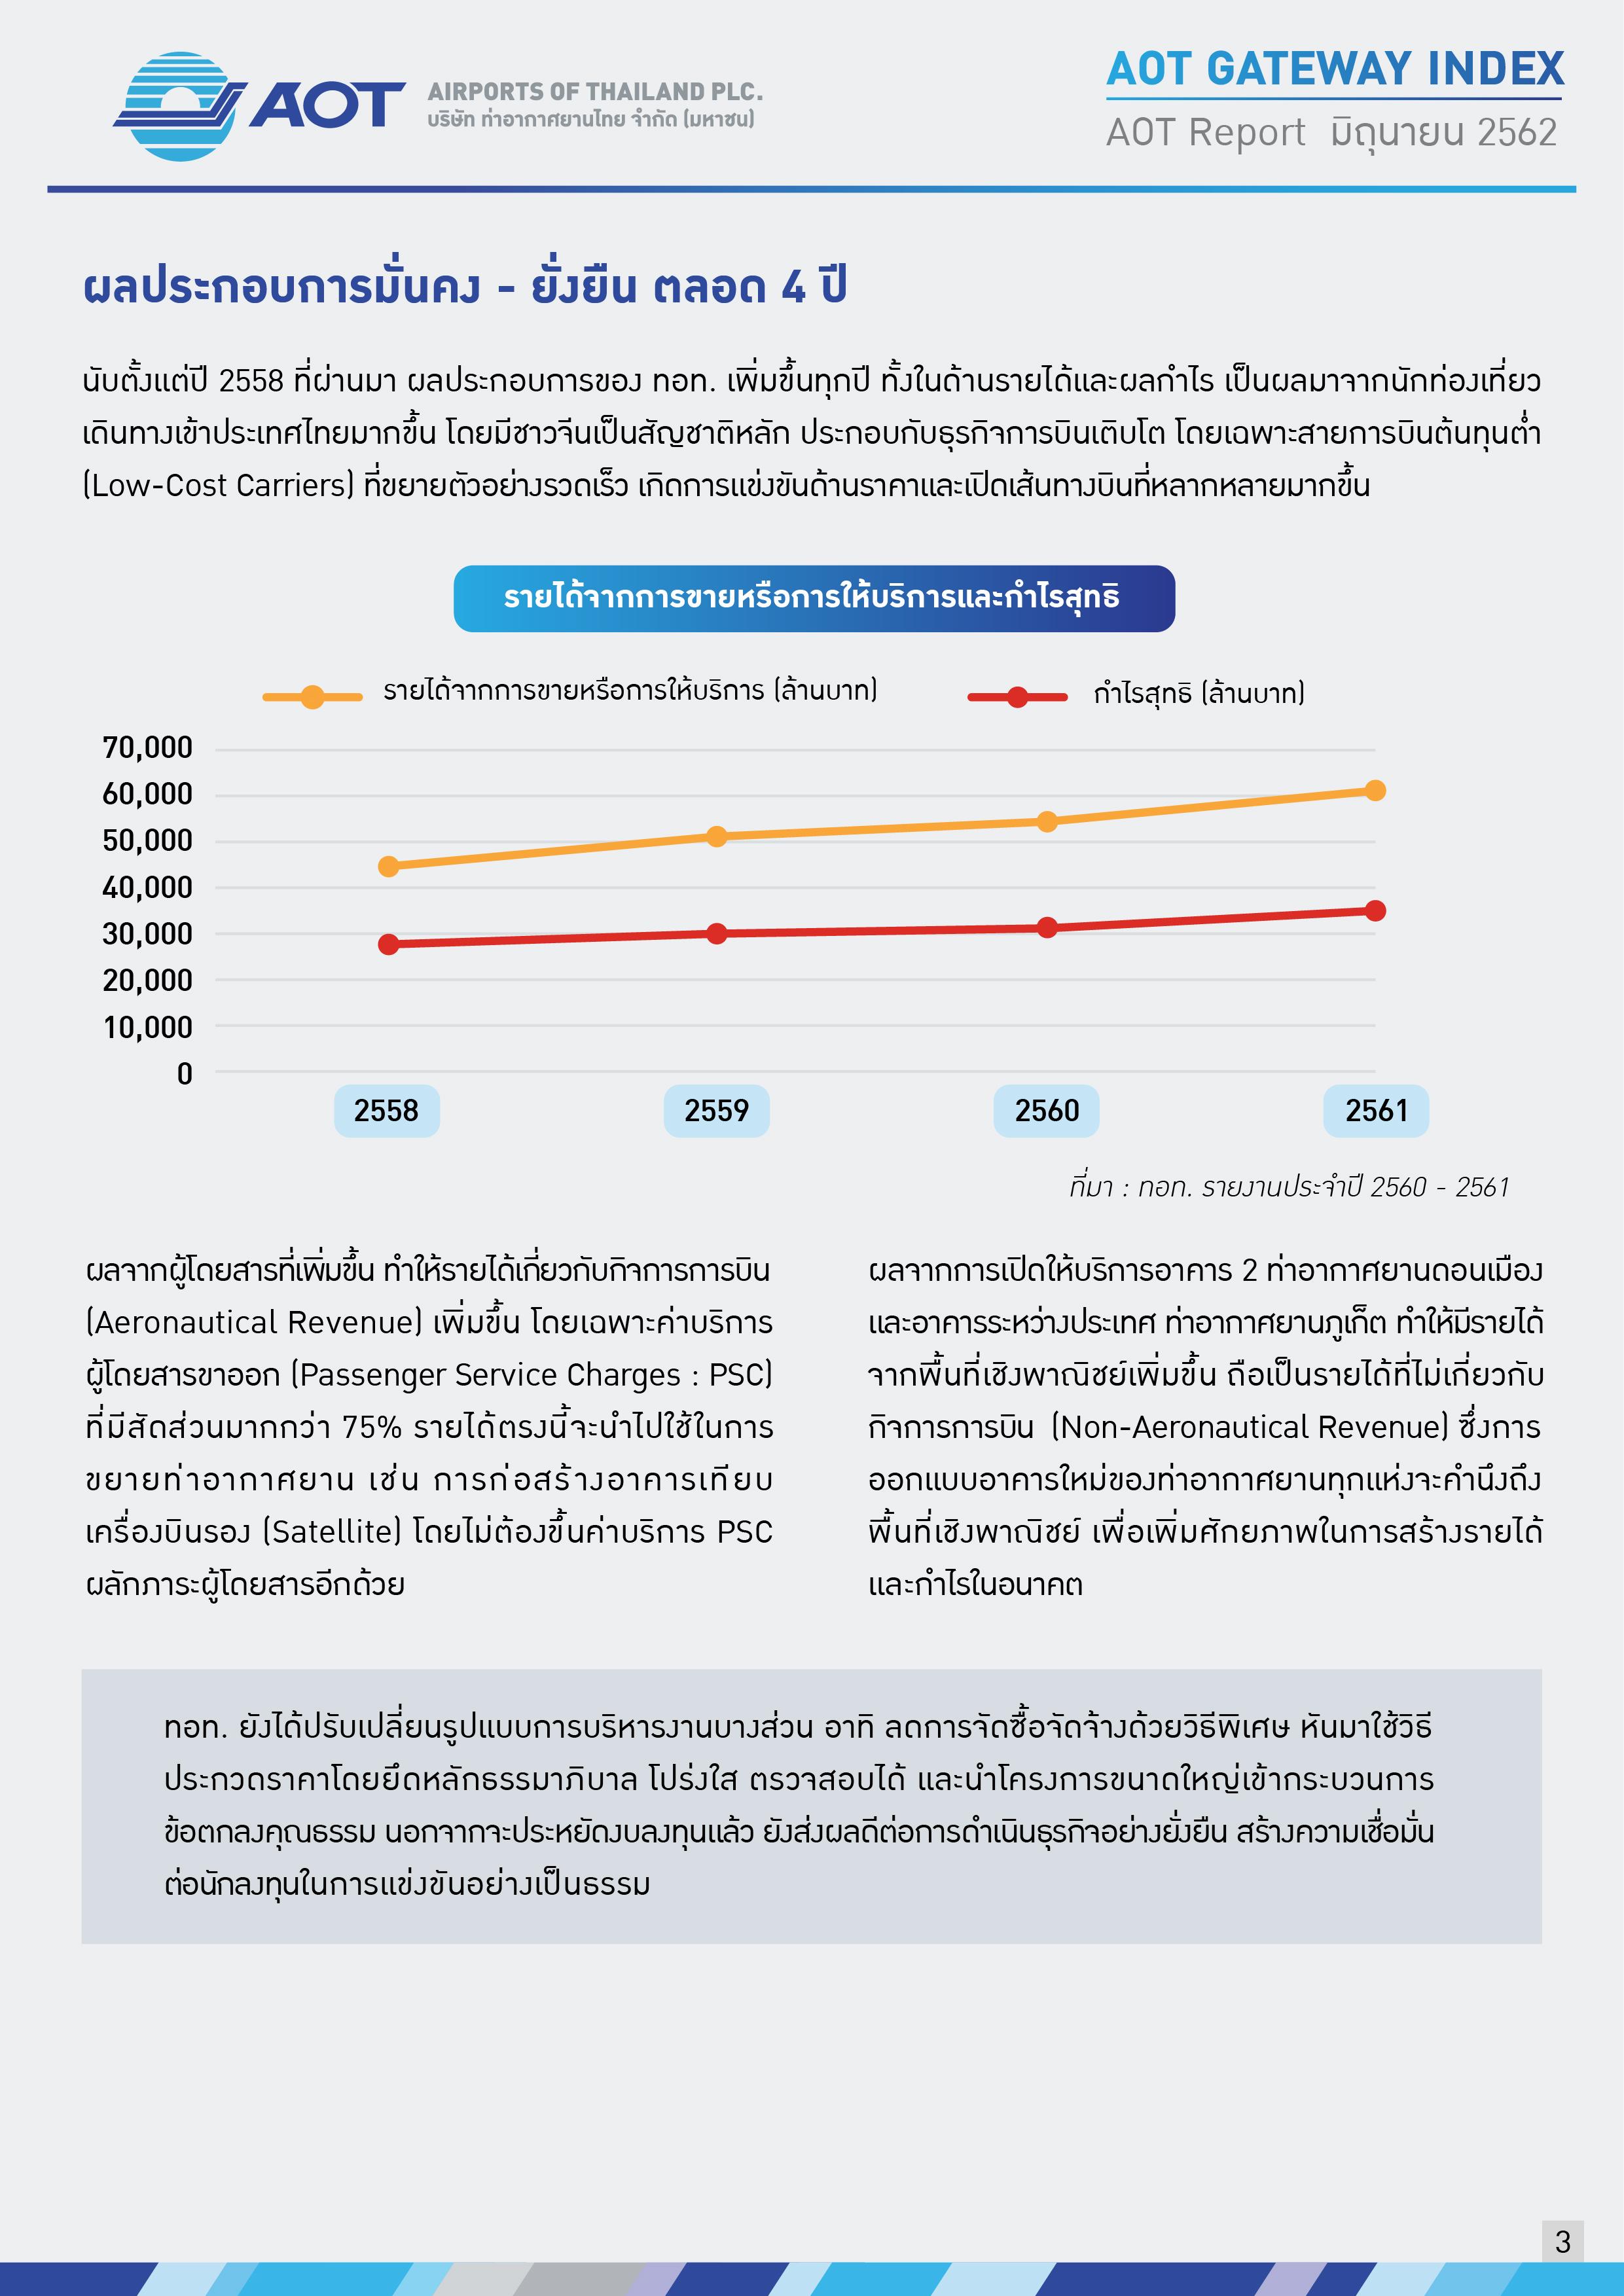 AOTcontent2019_Index7_AOT นิวไฮต่อเนื่อง 4 ปีซ้อน _ มุ่งสู่ปีที่ 5 โอกาสและความท้าทาย_V3_20190828_Page03